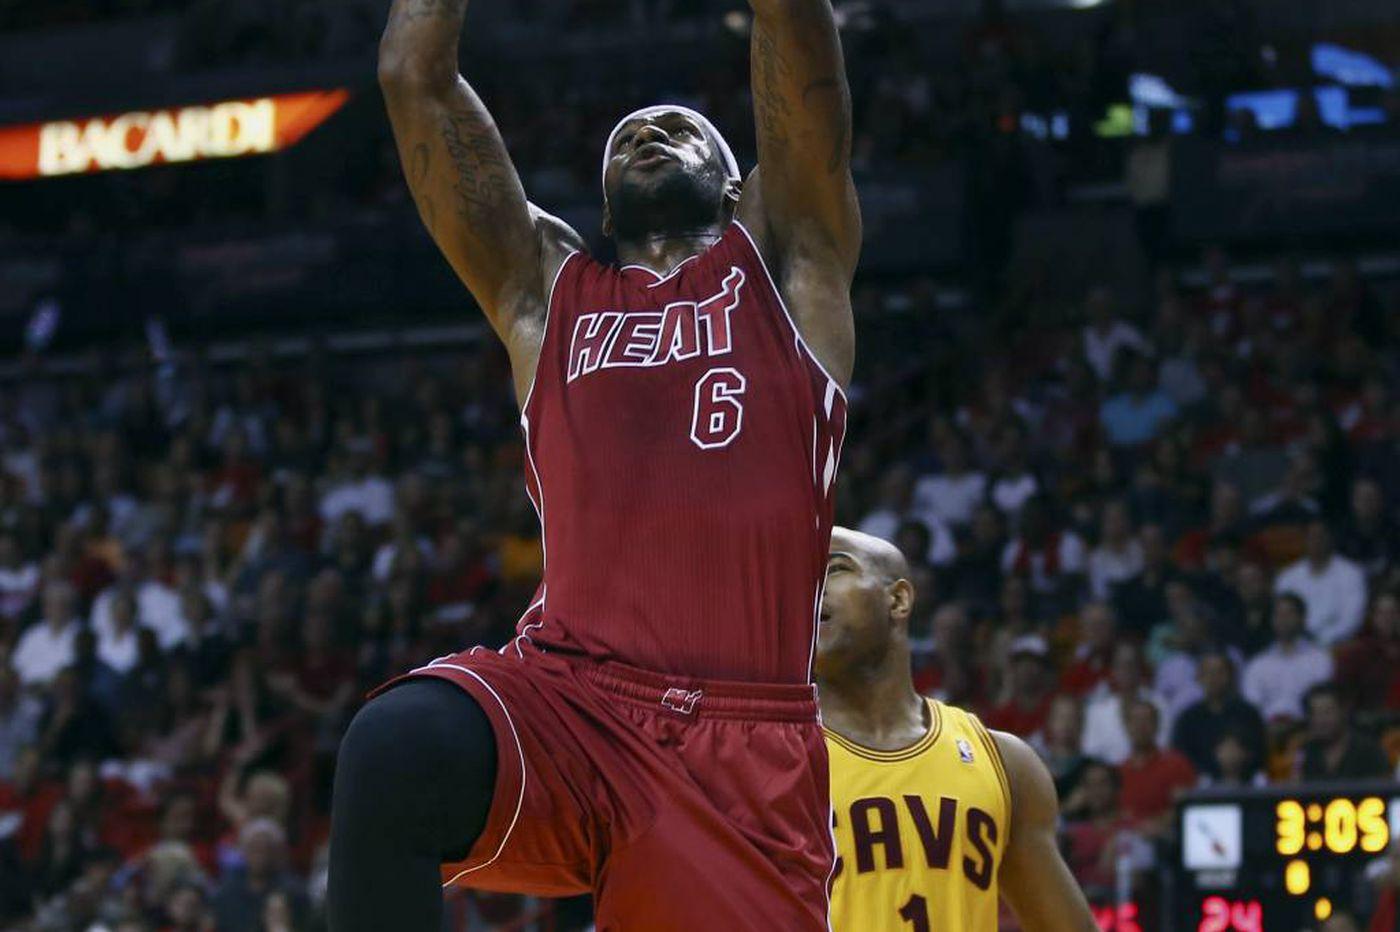 Heat down the Cavaliers